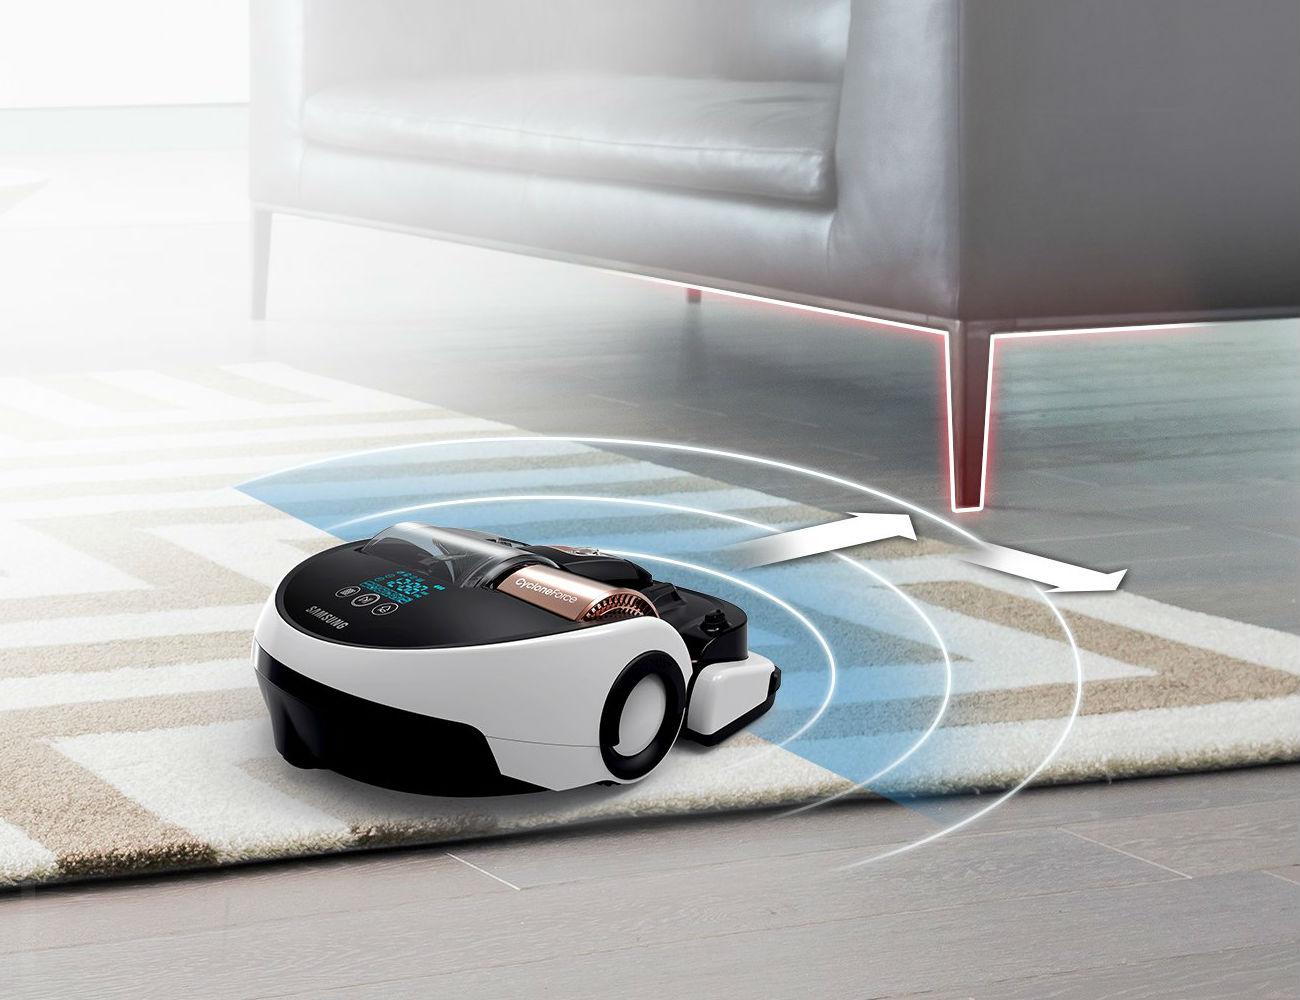 Samsung+POWERbot+VR9000+Robot+Vacuum